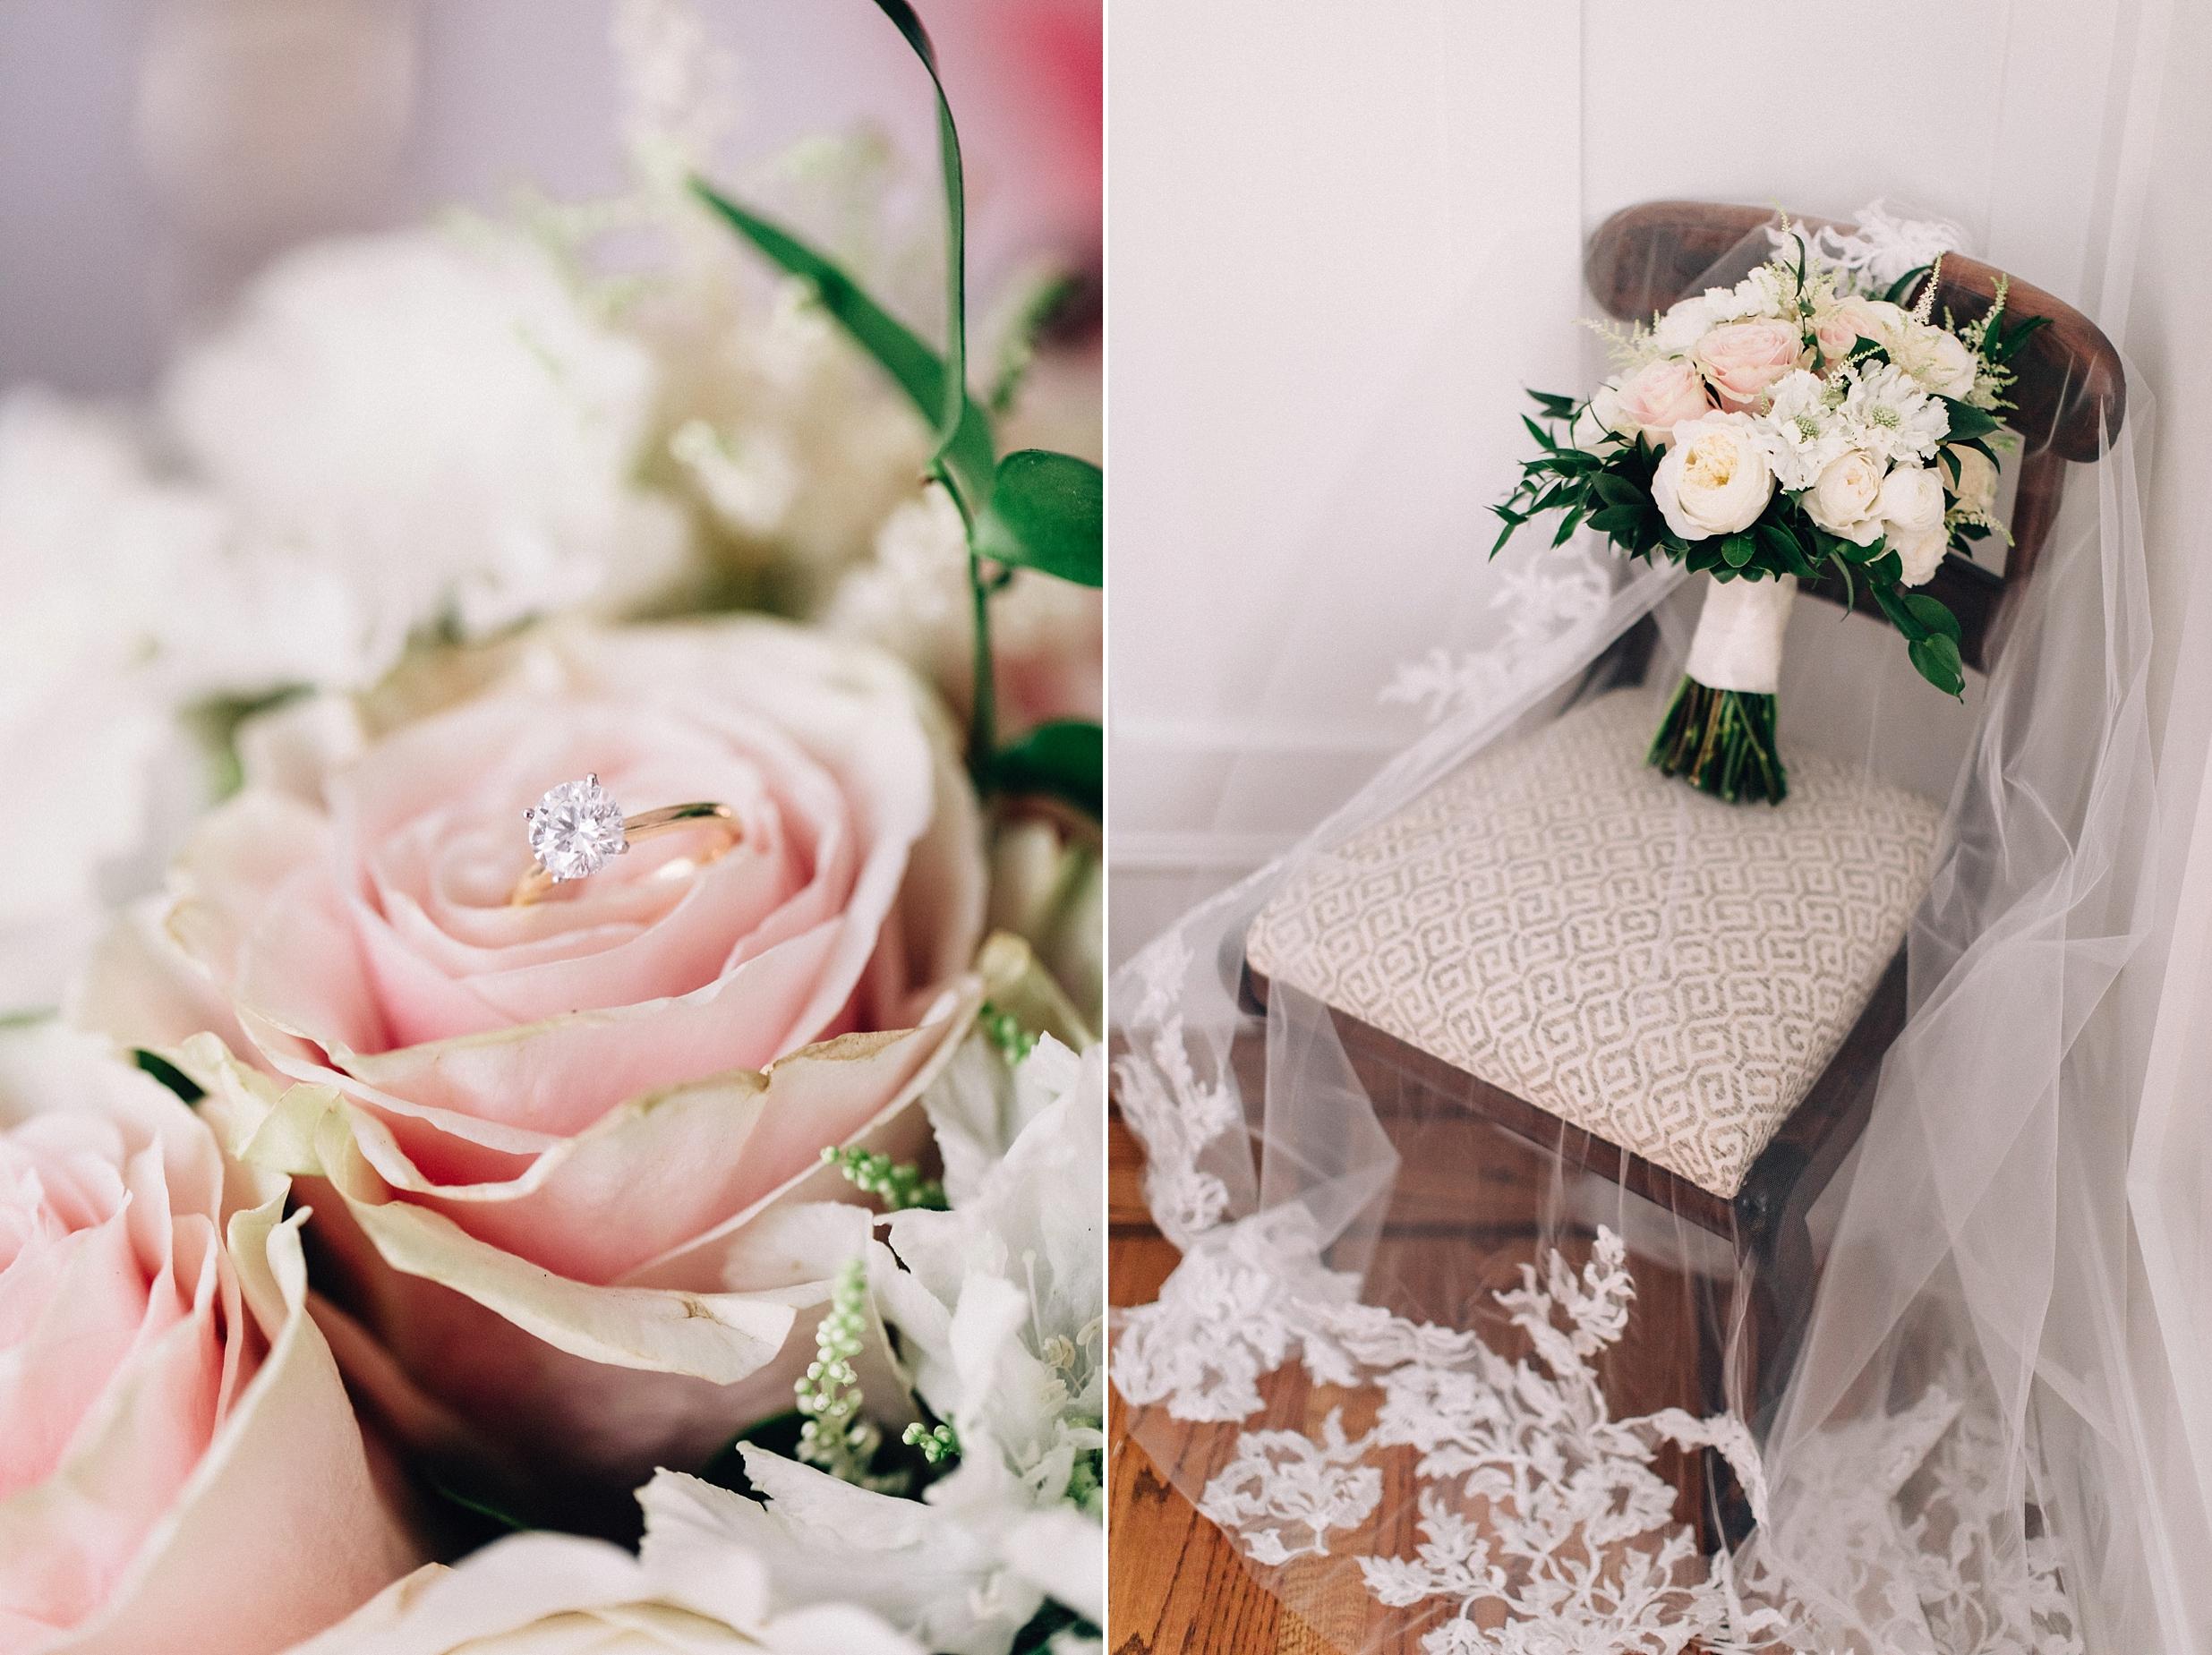 rumson-tented-wedding-nj-maine-conneticut-classic_0007.jpg